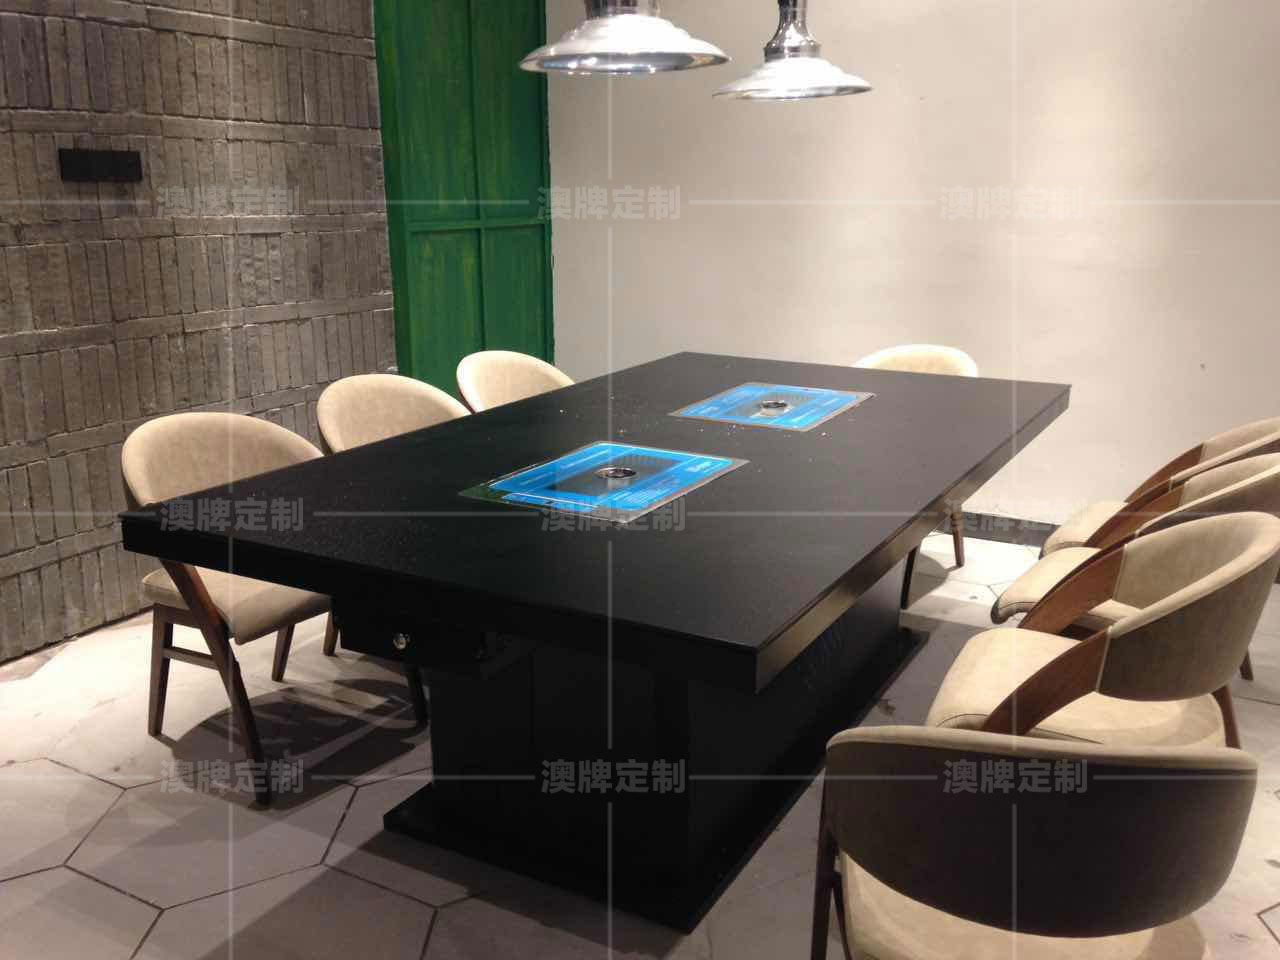 Z67B防滑玻璃类似雷竞技这种靠谱的桌+DT28.jpg